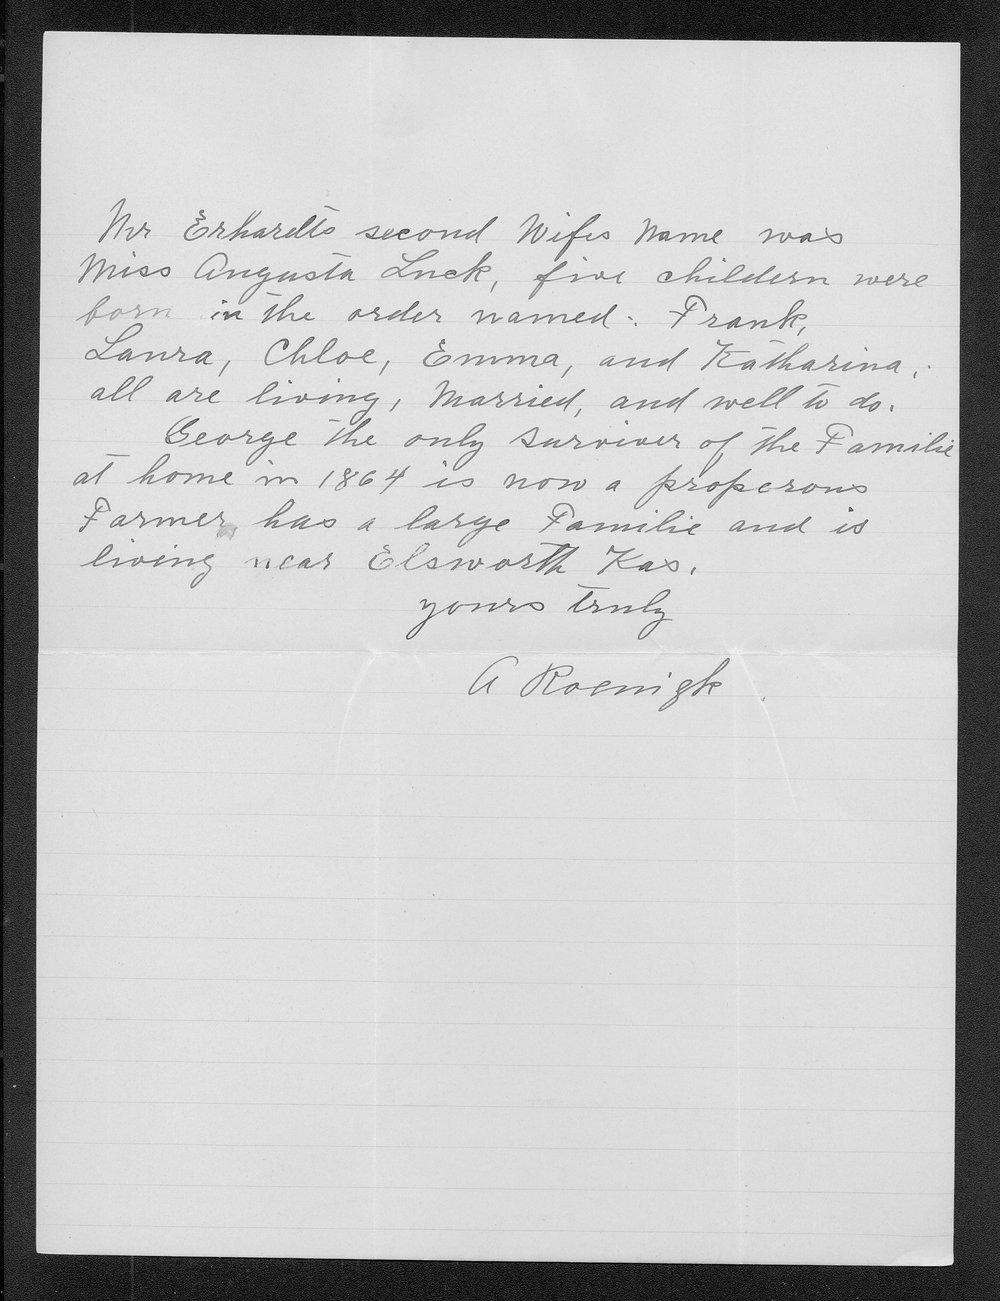 A. Roenigk to George W. Martin - 2